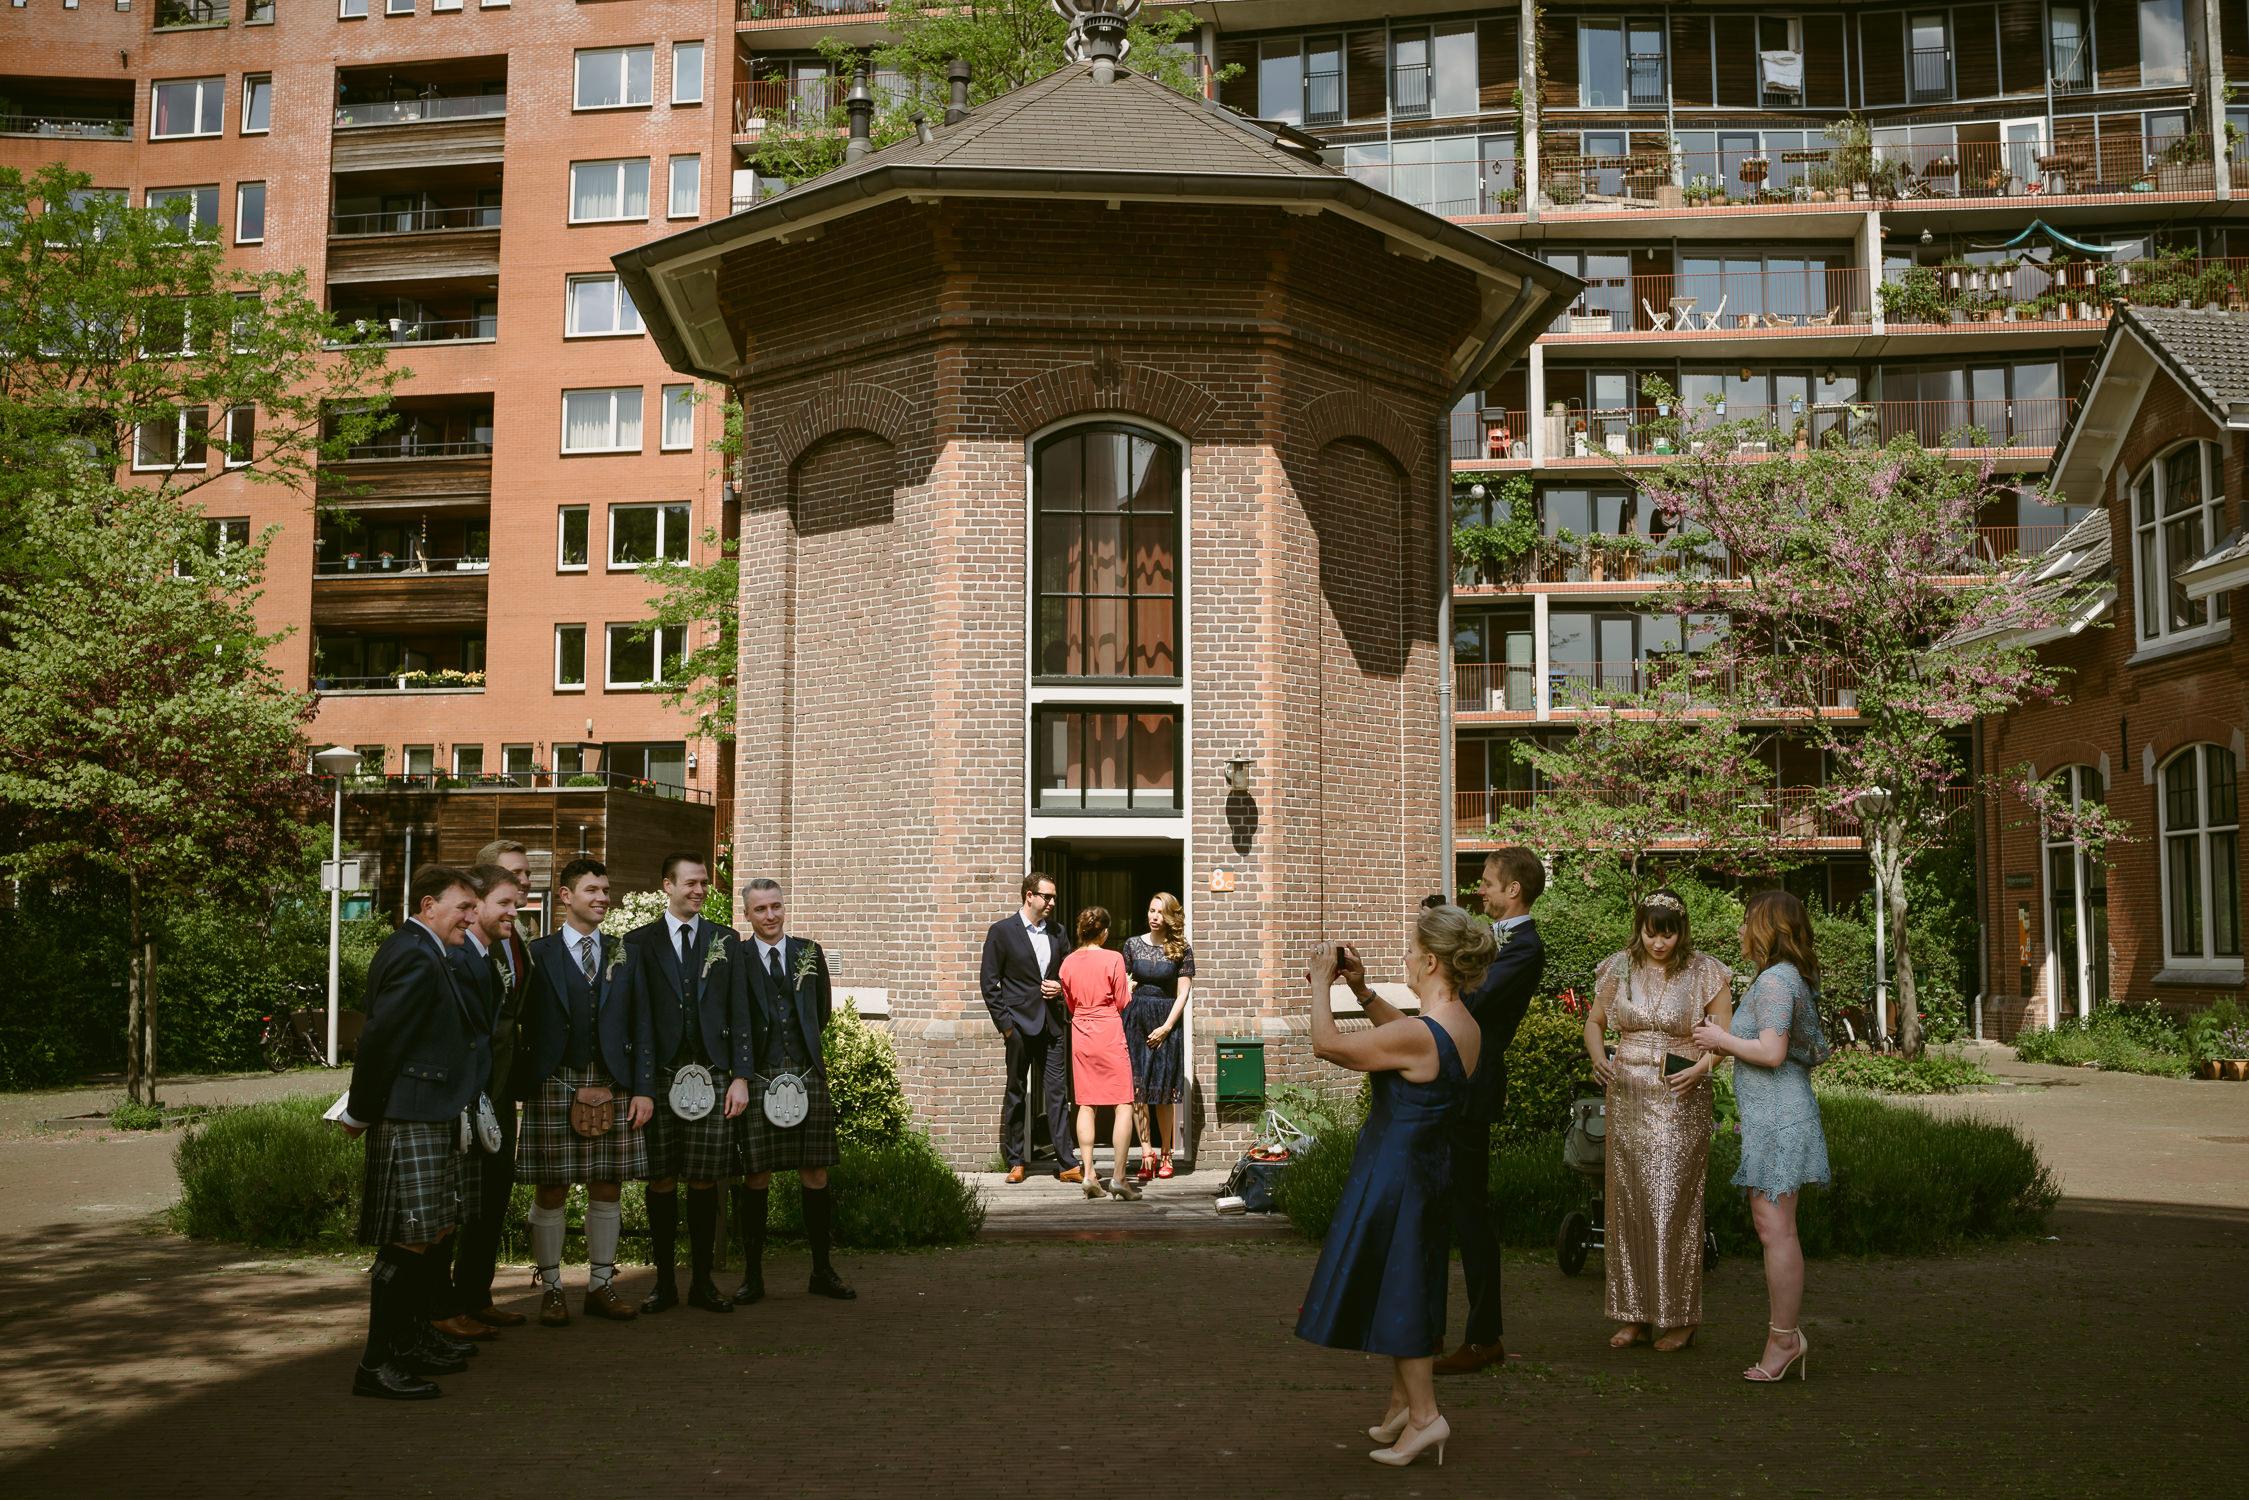 amsterdam-wedding-photographer-trouwfotograaf-bruidsfotograaf-mark-hadden-bruidsfotografie-David & Ronald-074.jpg